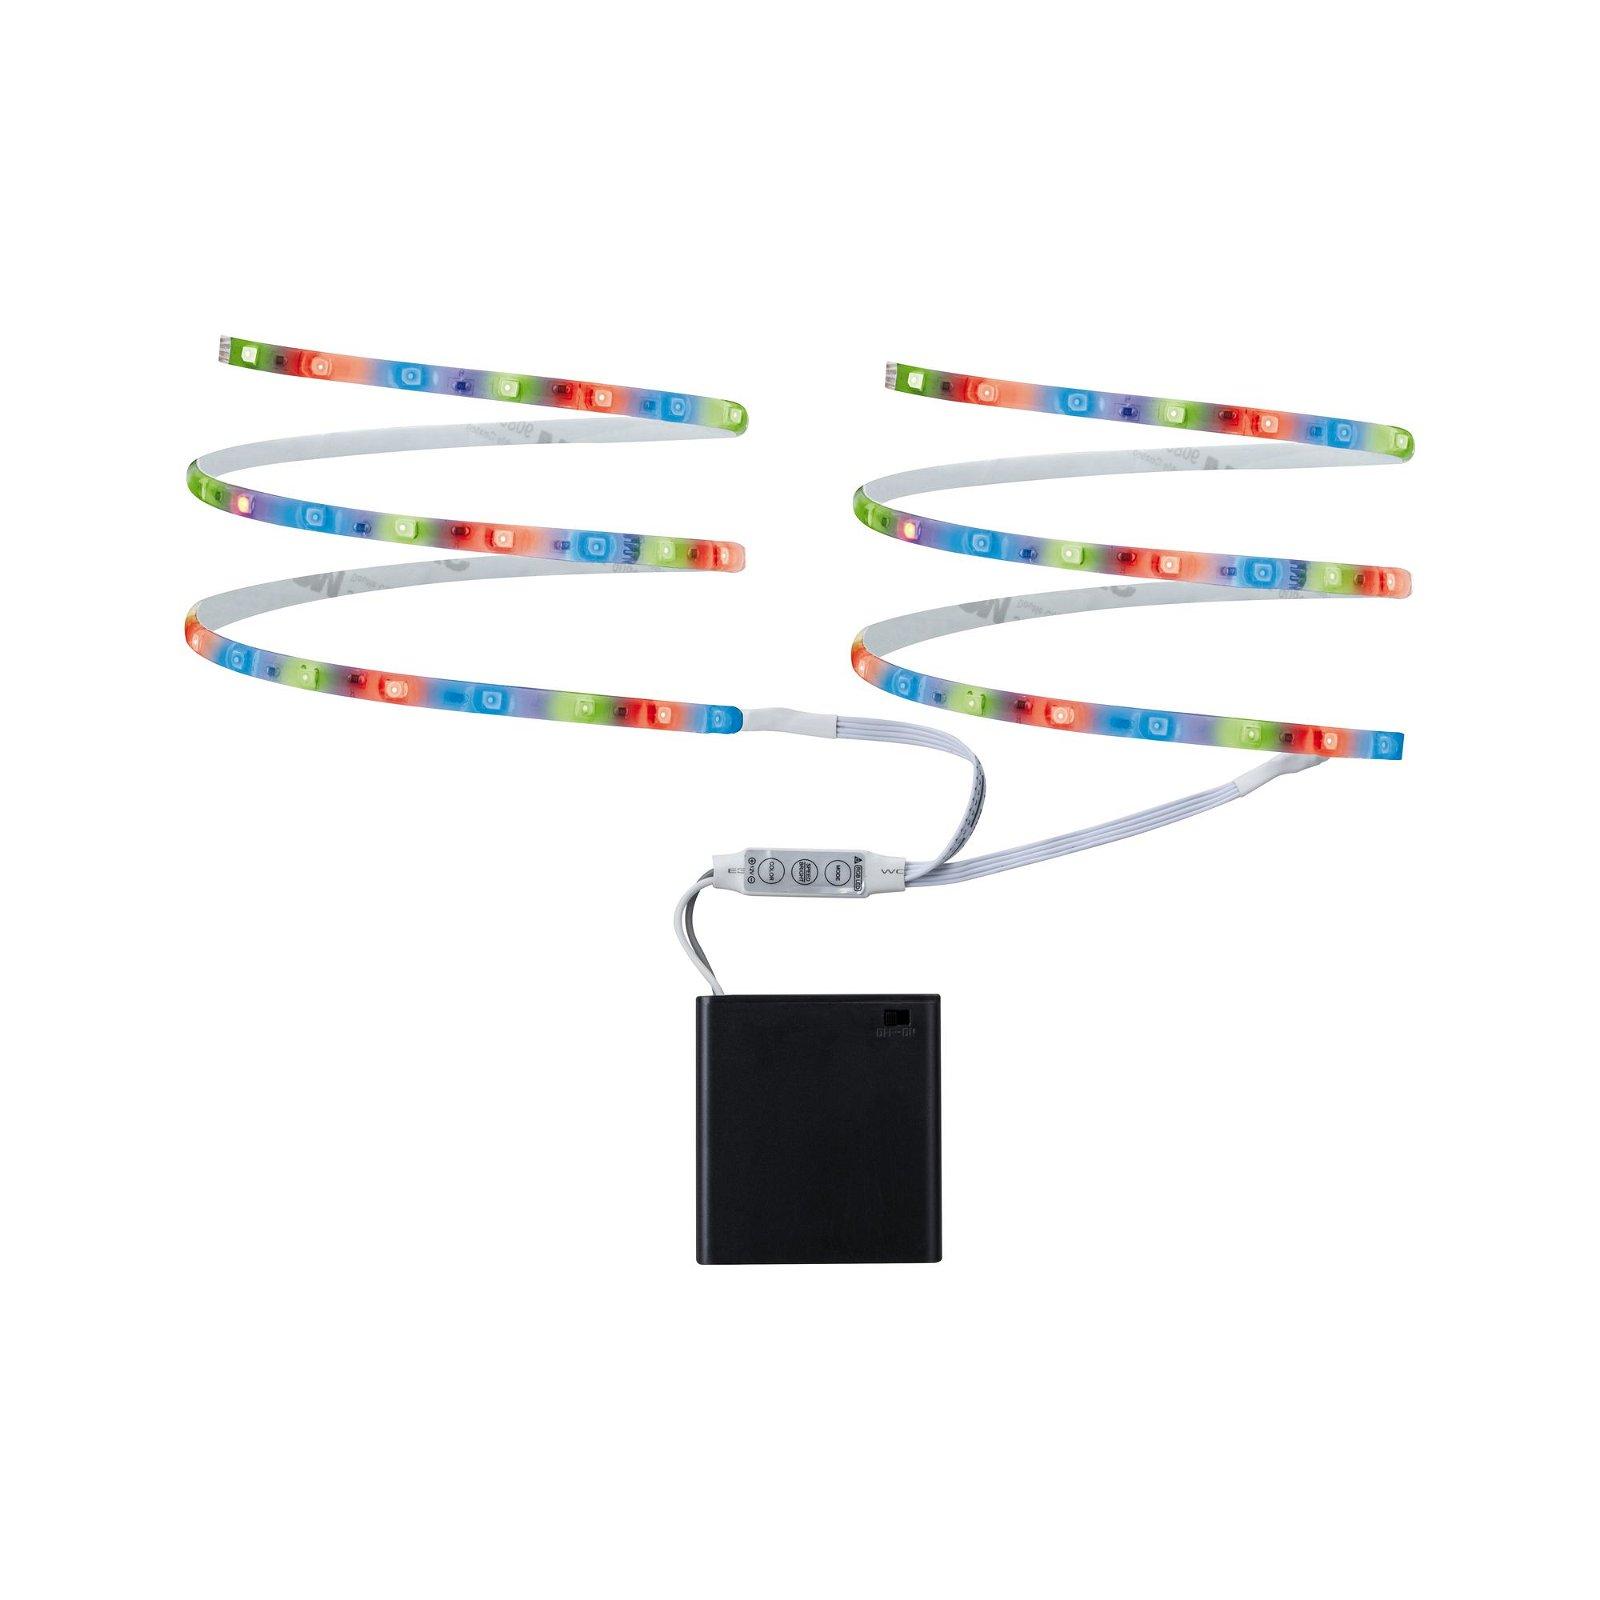 Mobil Strip 0,8m 2x1,2W 35lm/m RGB